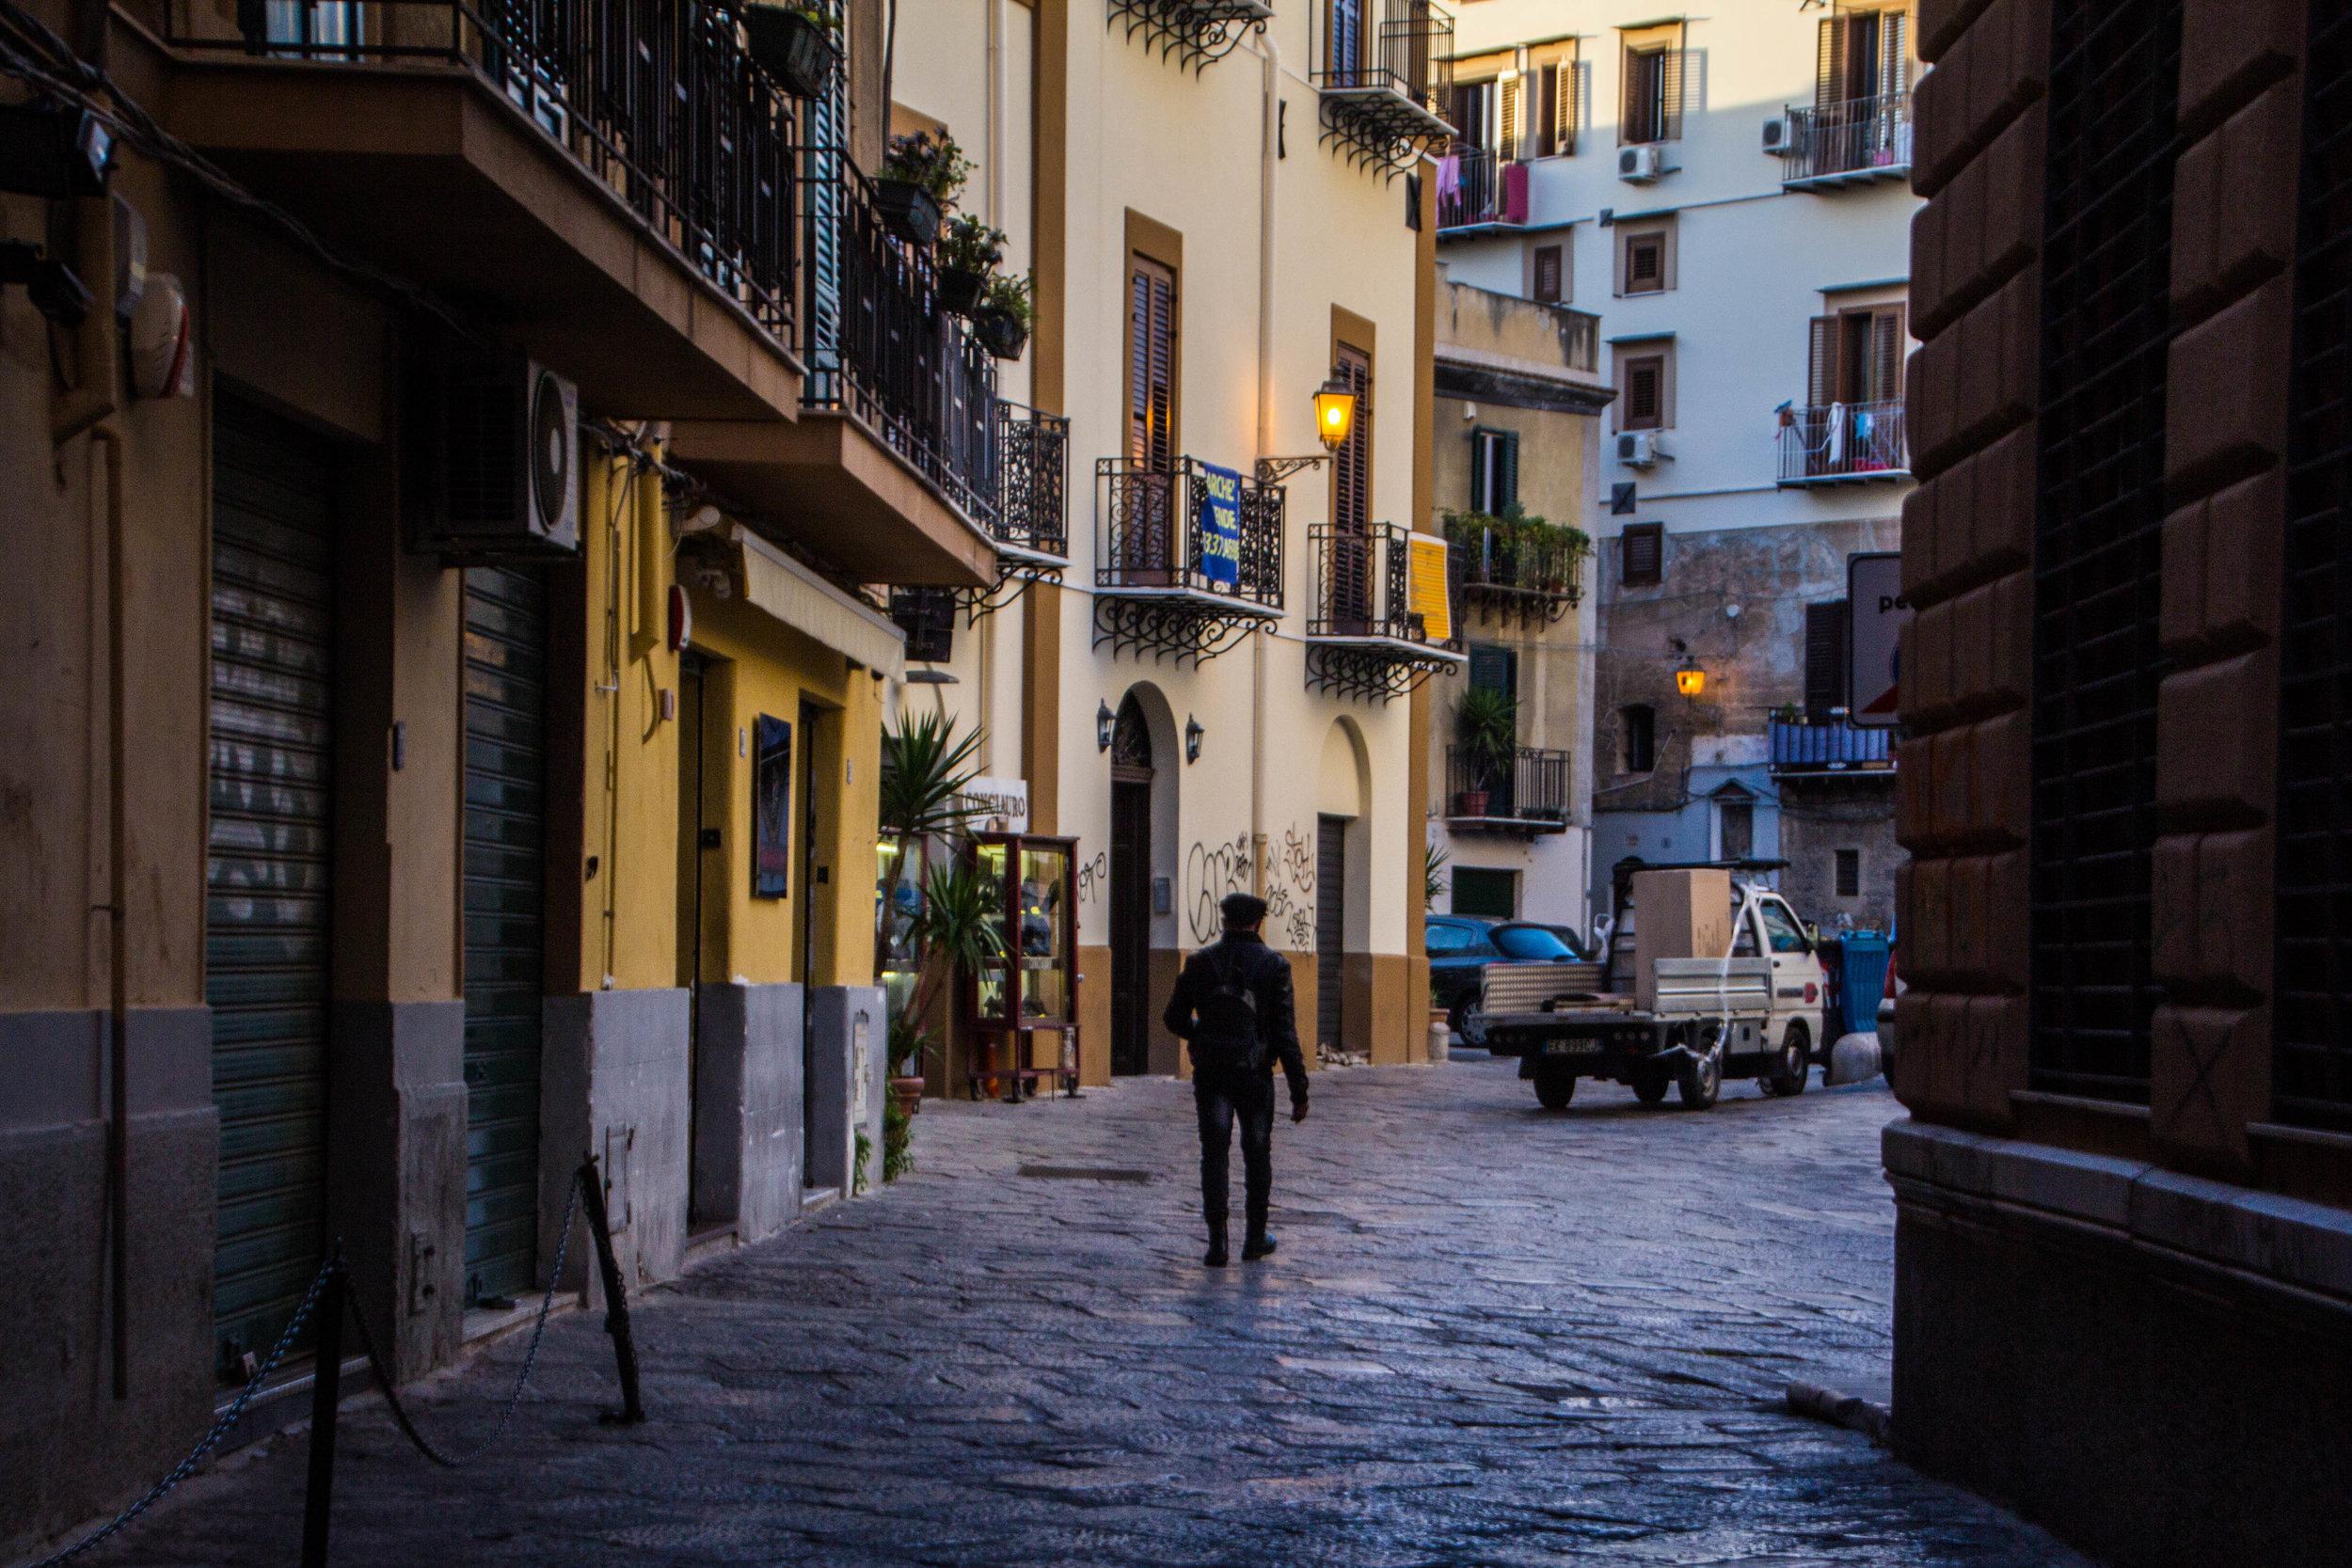 streets-palermo-sicily-12.jpg